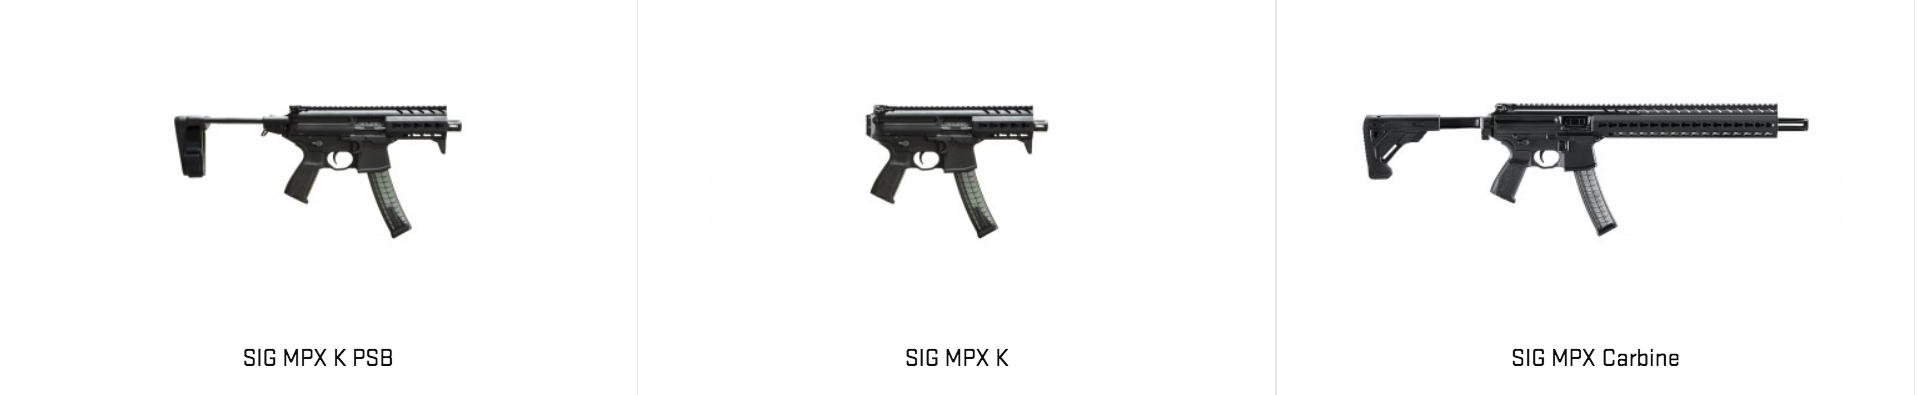 SIG Sauer MPX K PSB | OutdoorHub